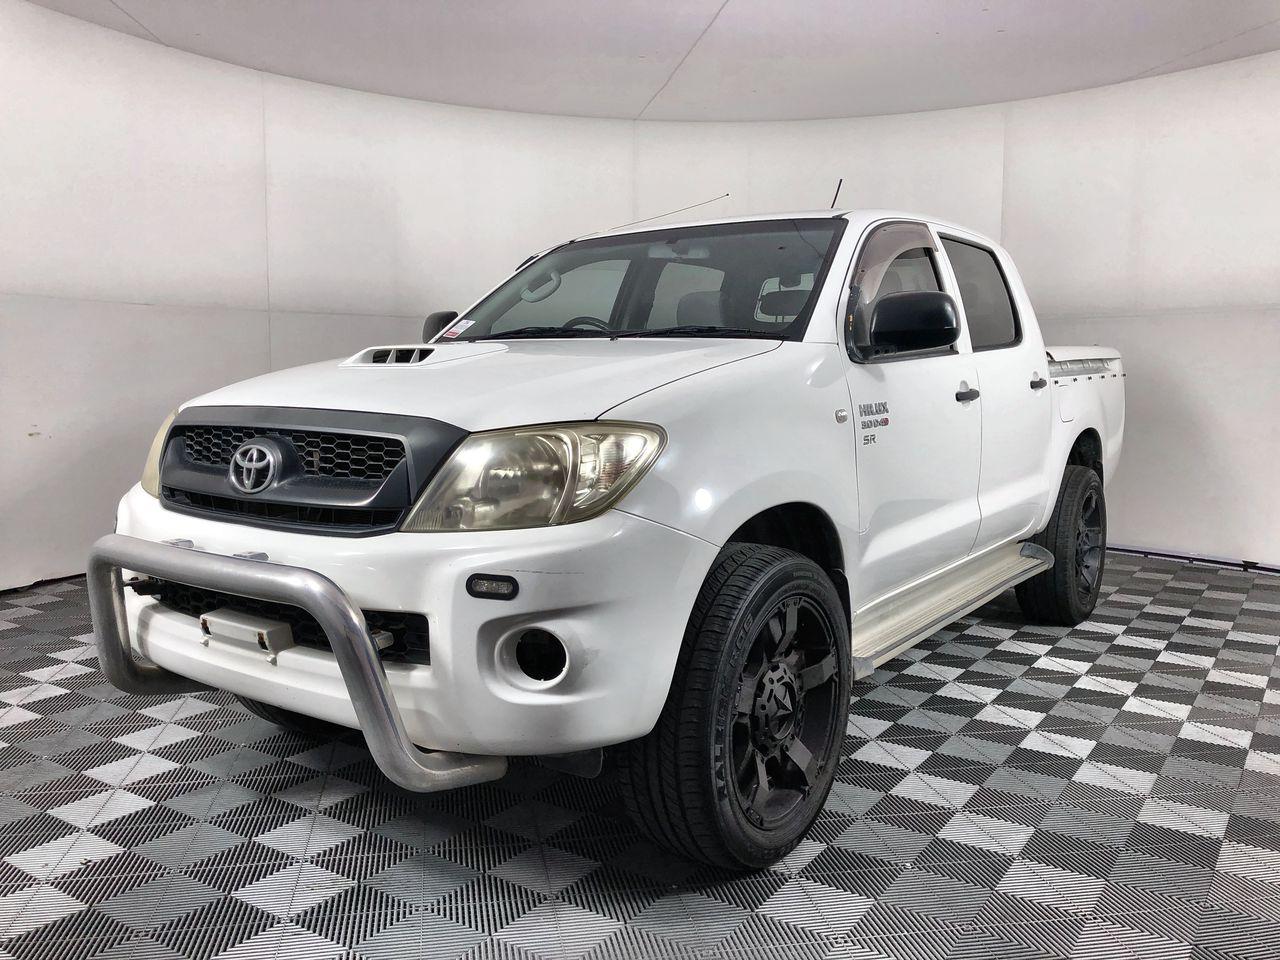 2008 Toyota Hilux SR (4x4) KUN26R Turbo Diesel Manual Crew Cab Chassis